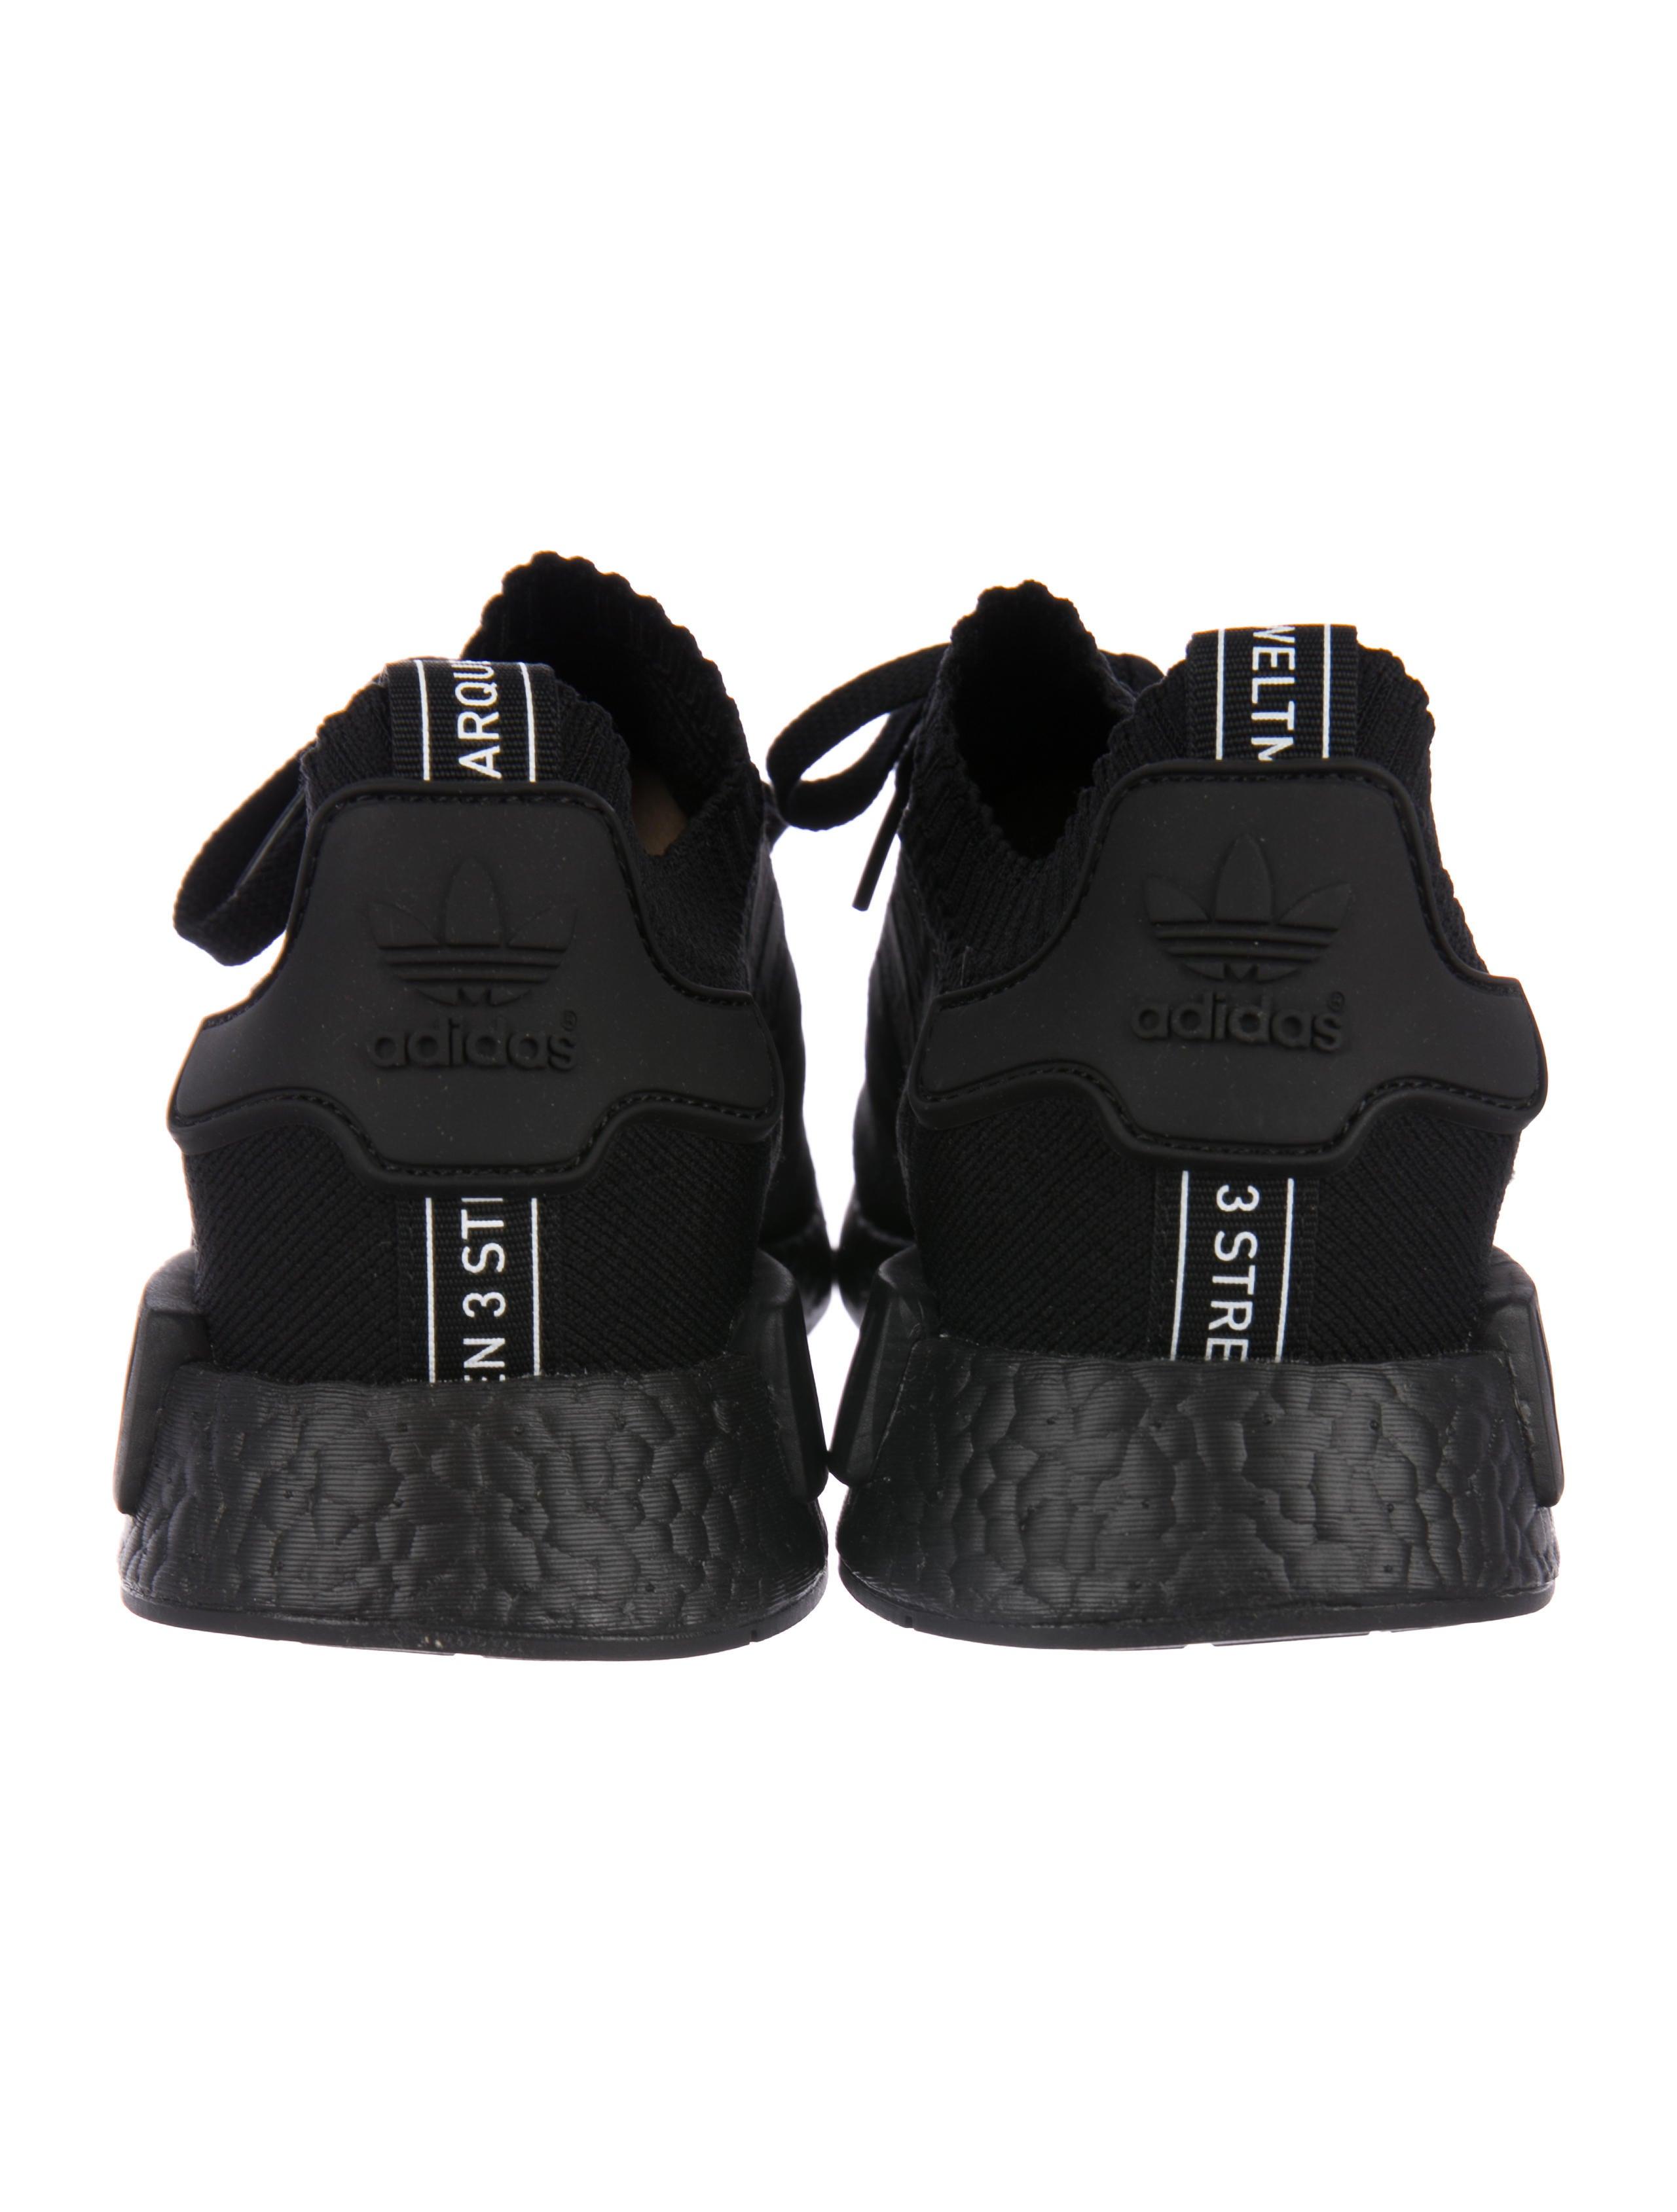 adidas 2017 nmd r1 pk giappone triple black scarpe w / tag scarpe